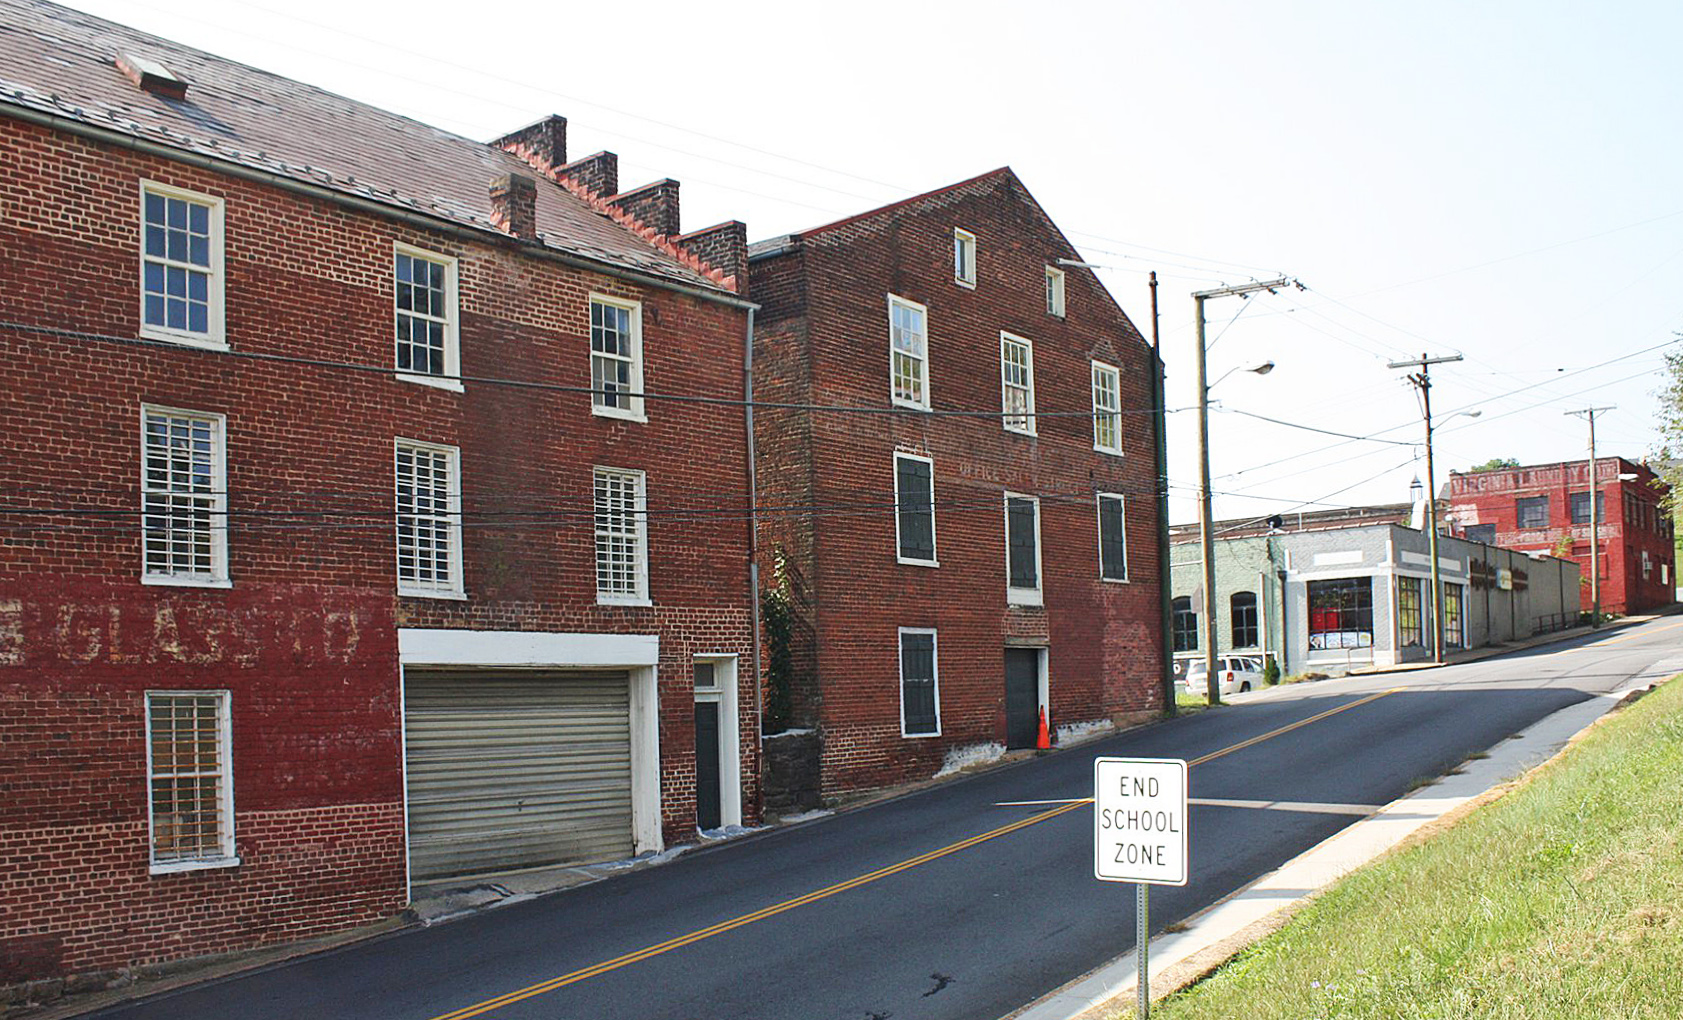 Twelfth Street Industrial Historic District